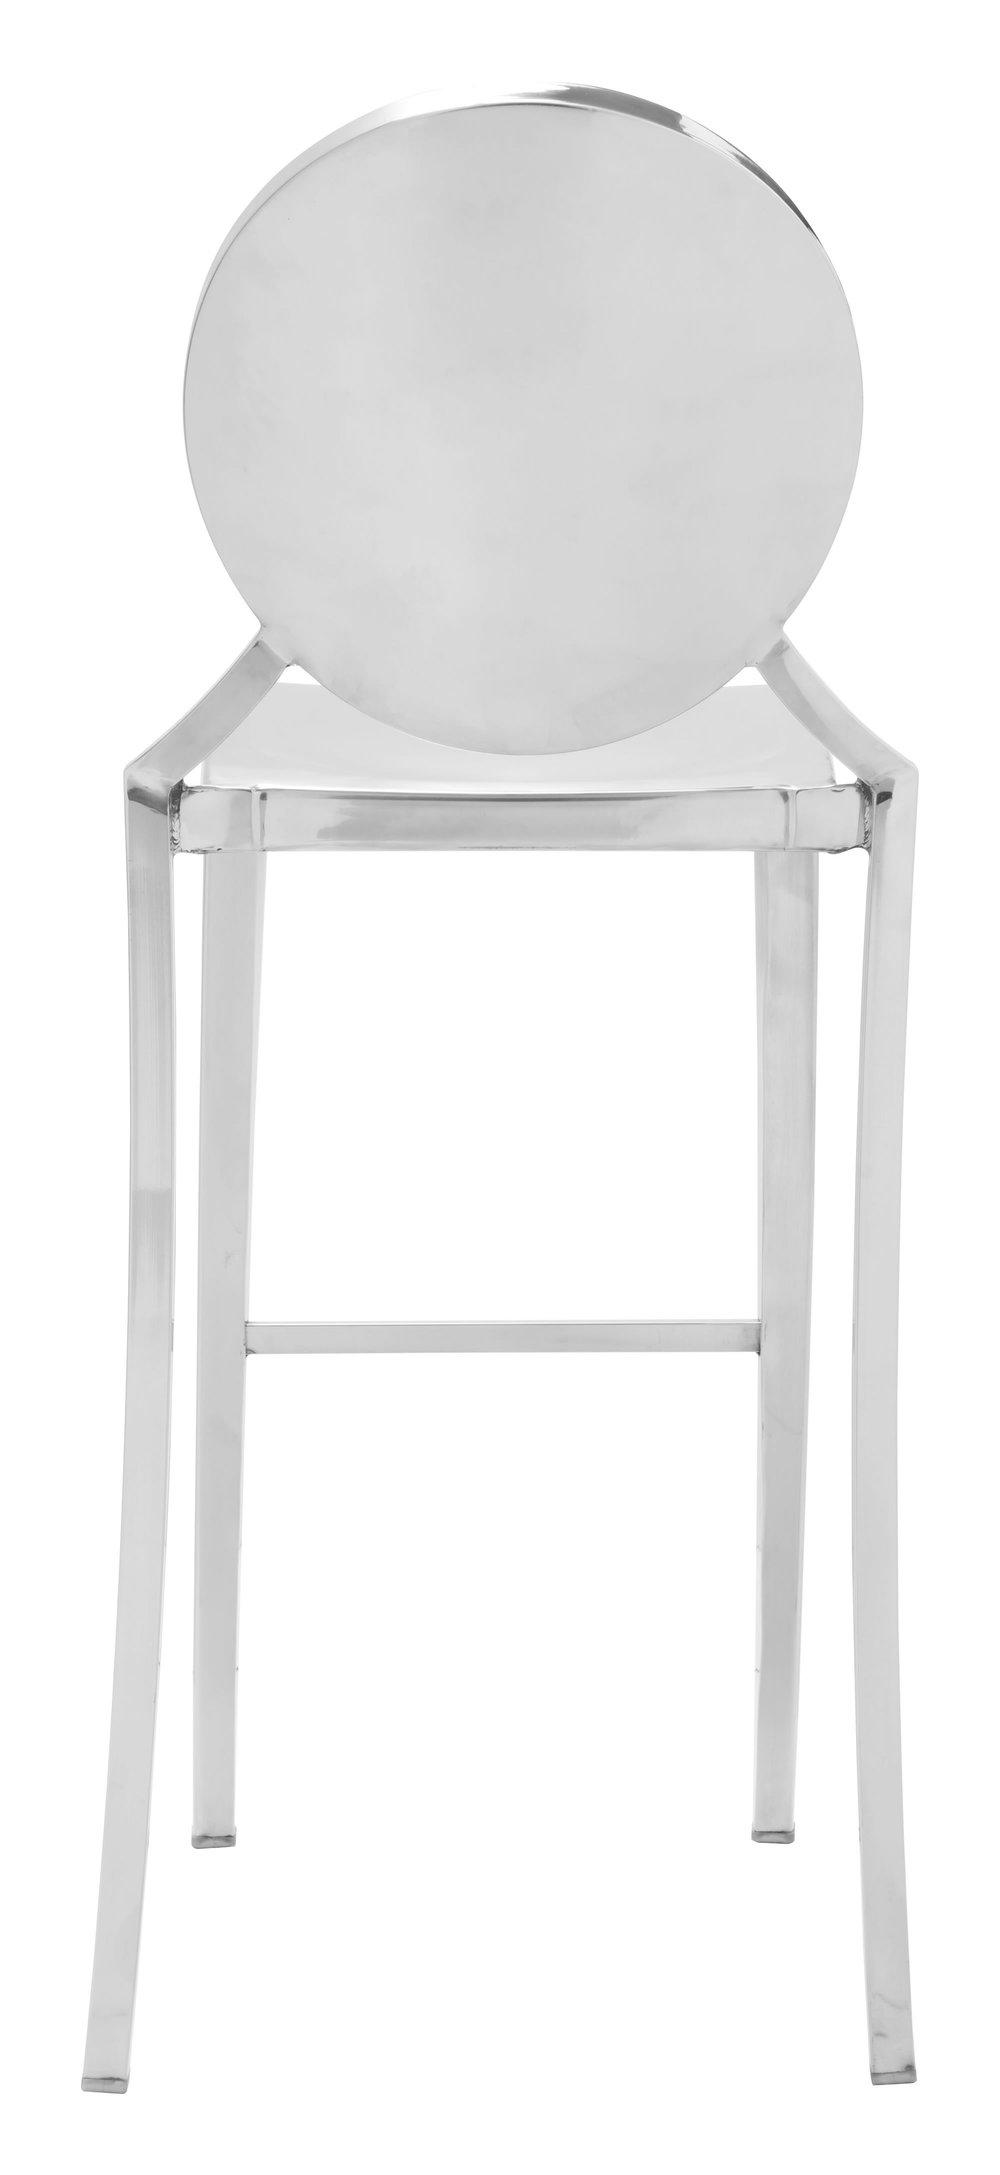 Zuo Modern Contemporary - Eclipse Bar Chair, Set/2, Stainless Steel